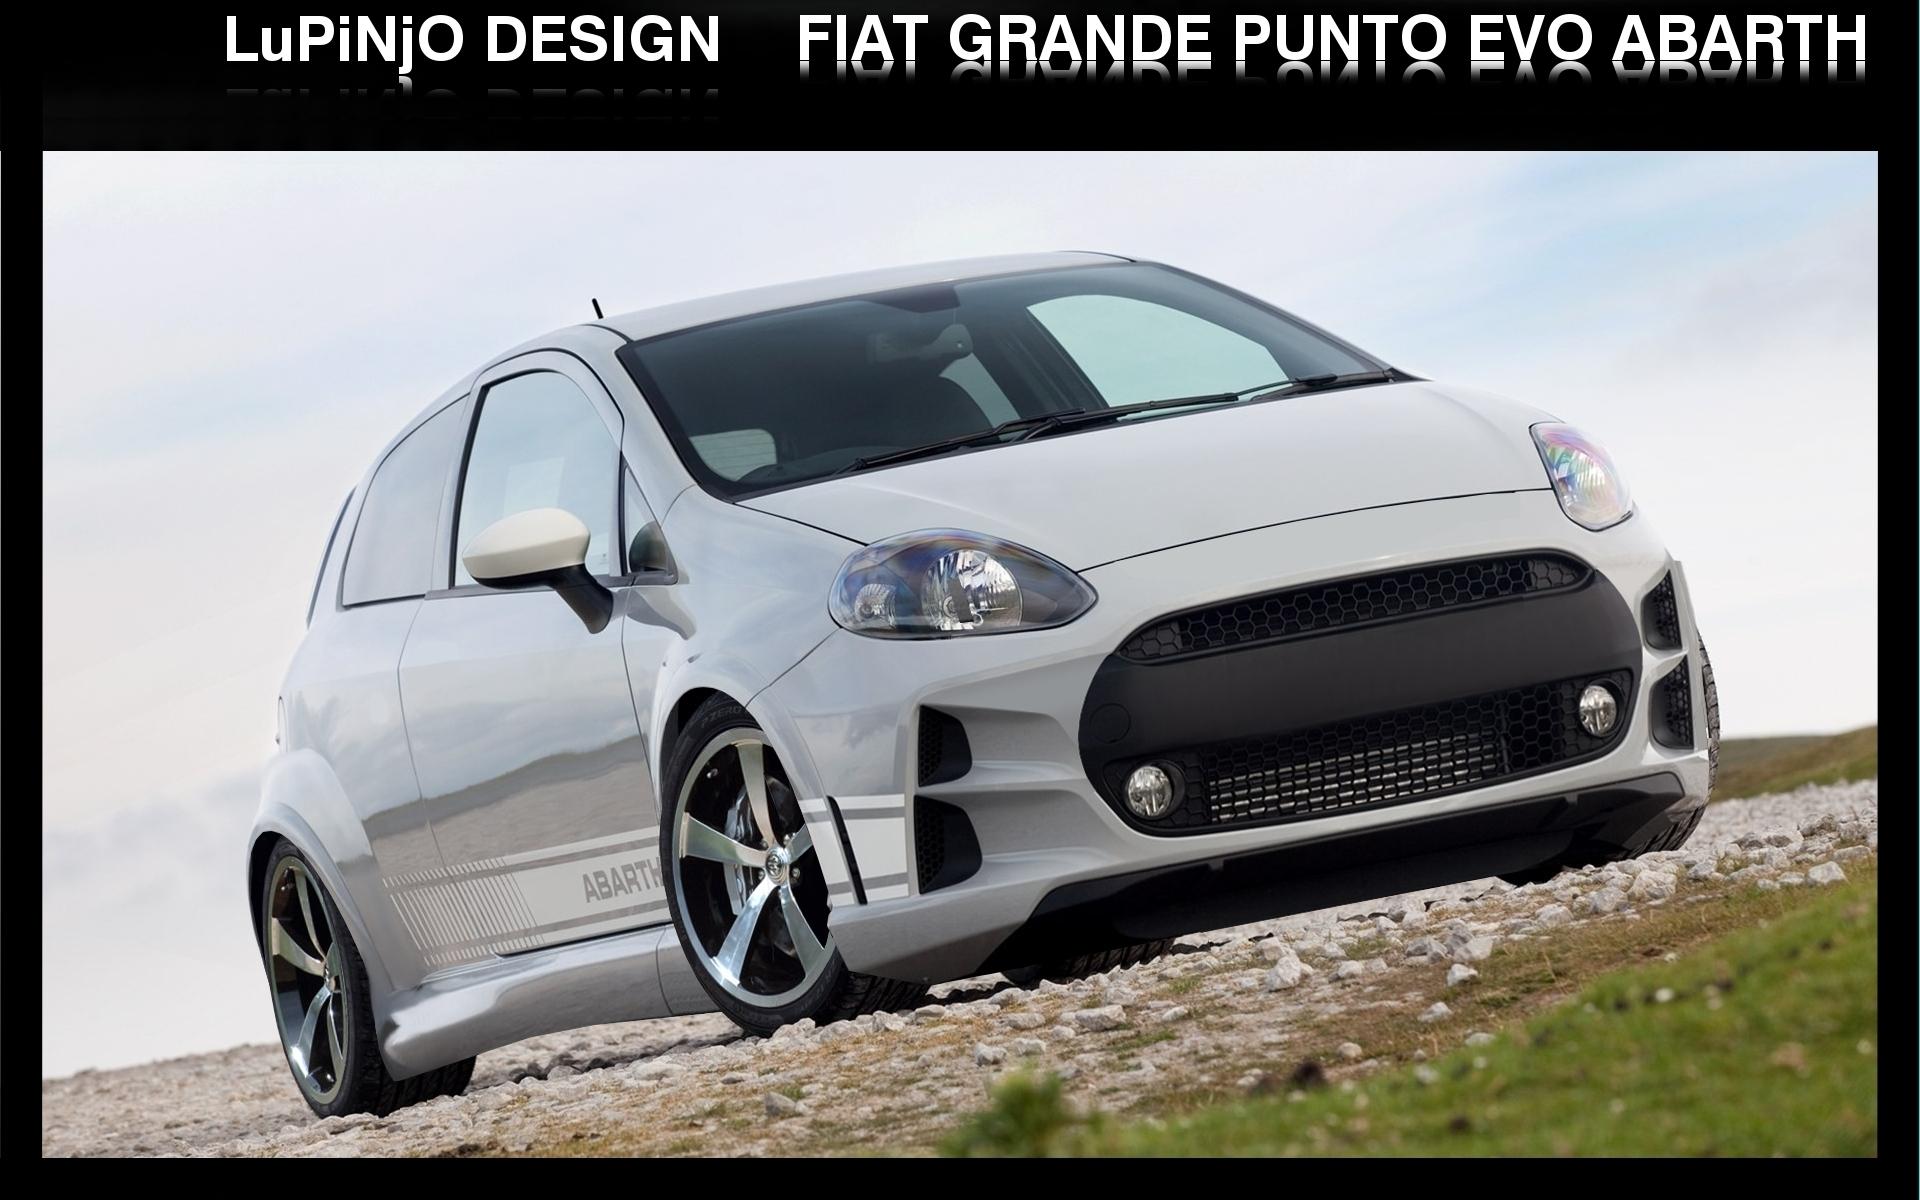 Virtual Tuning Punto Evo e Punto 2012 Fiat_grande_punto_evo_abarth_by_LuPiNjO